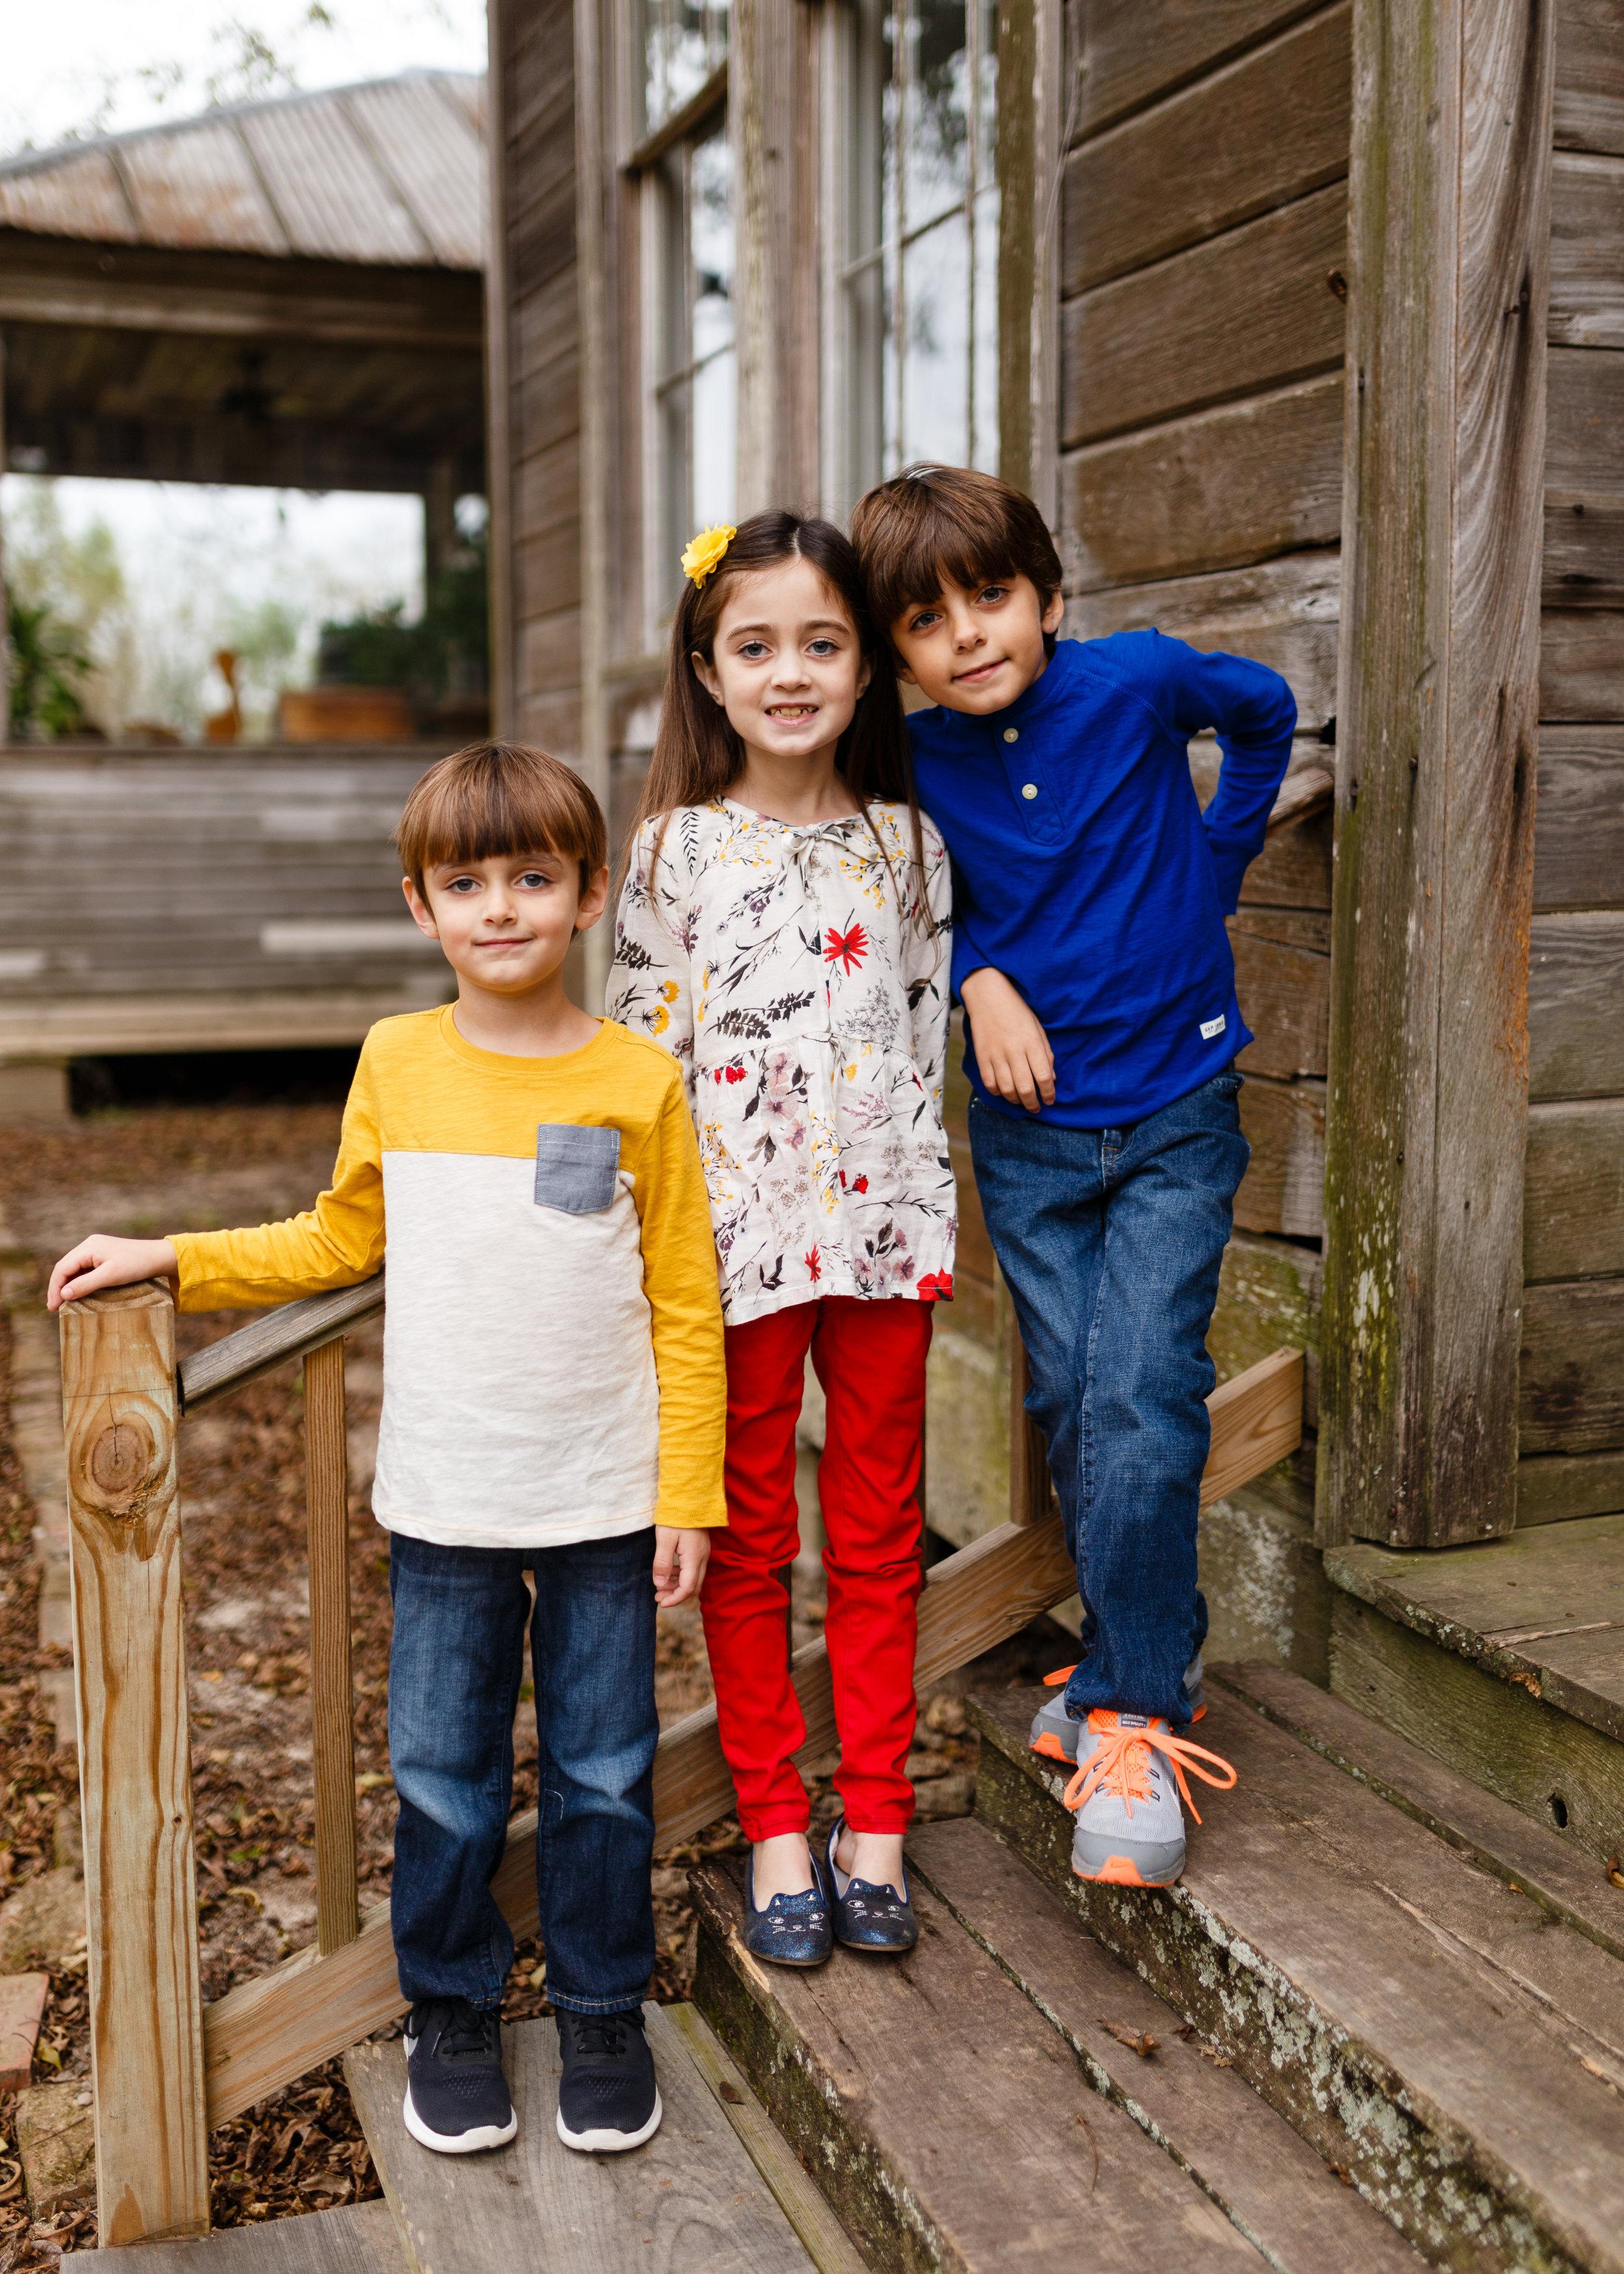 Family-child-portrait-lafayette-broussard-youngsville-photographer-1-3.jpg